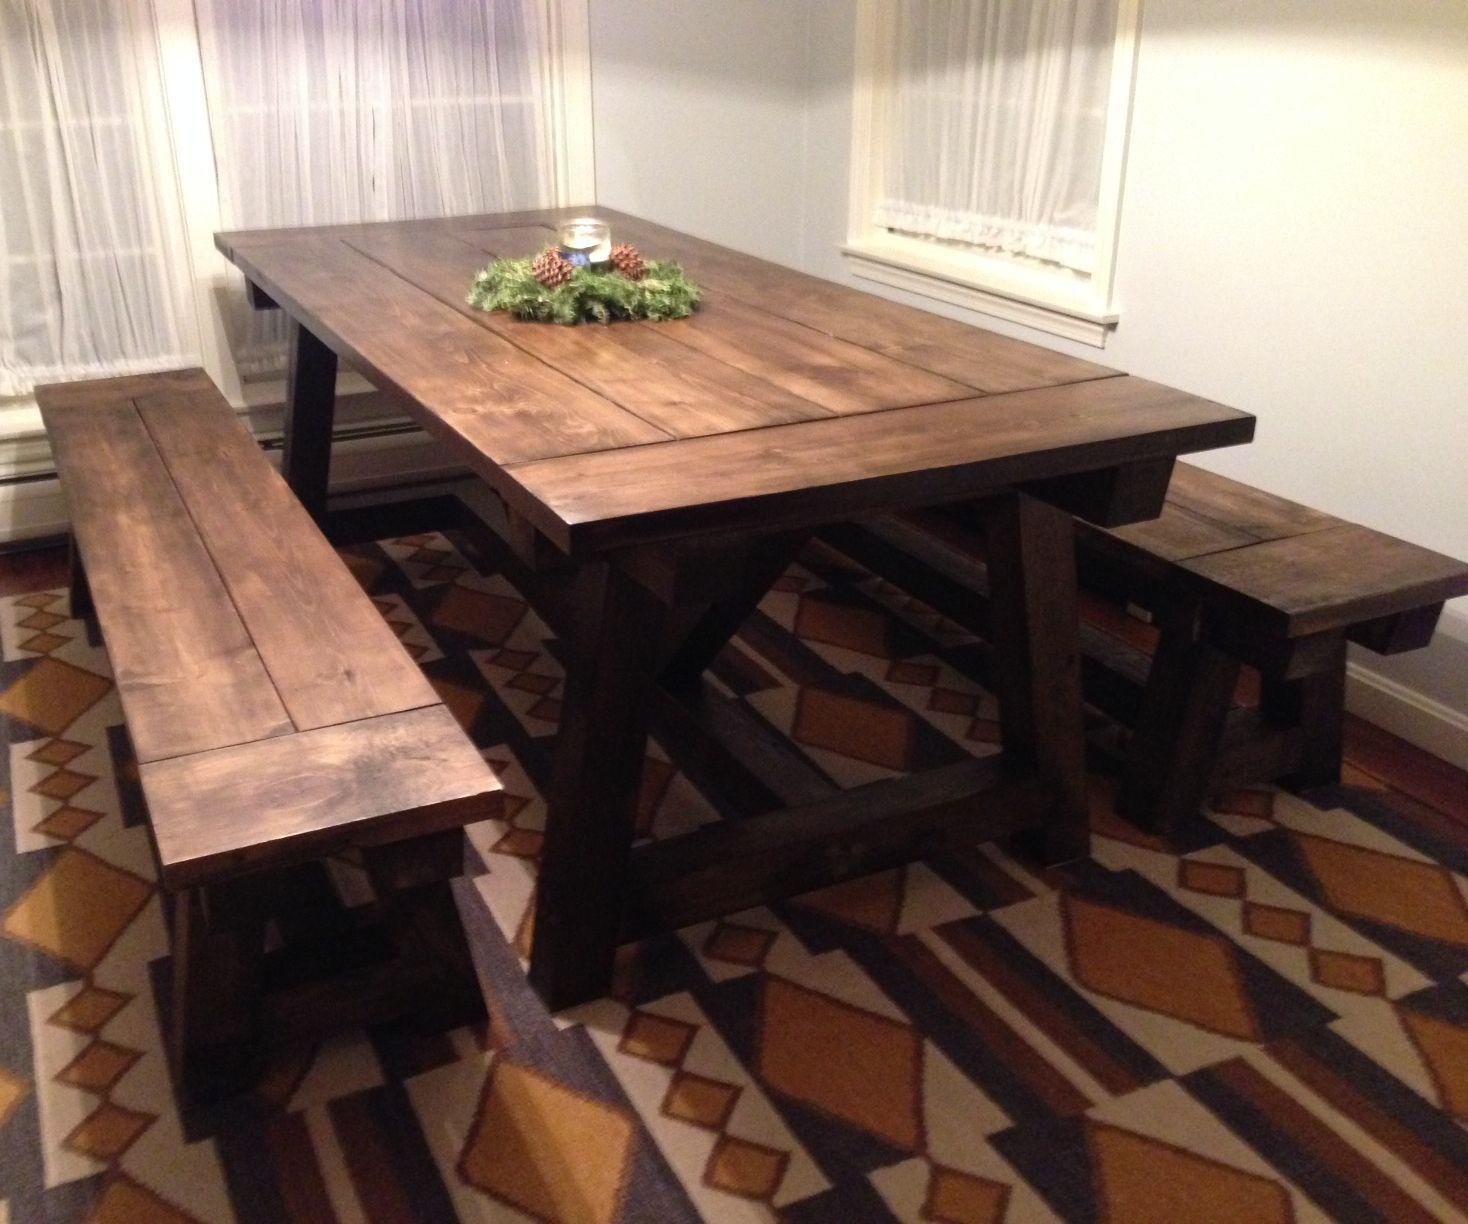 Benches for the farmhouse table farmhouse kitchen table